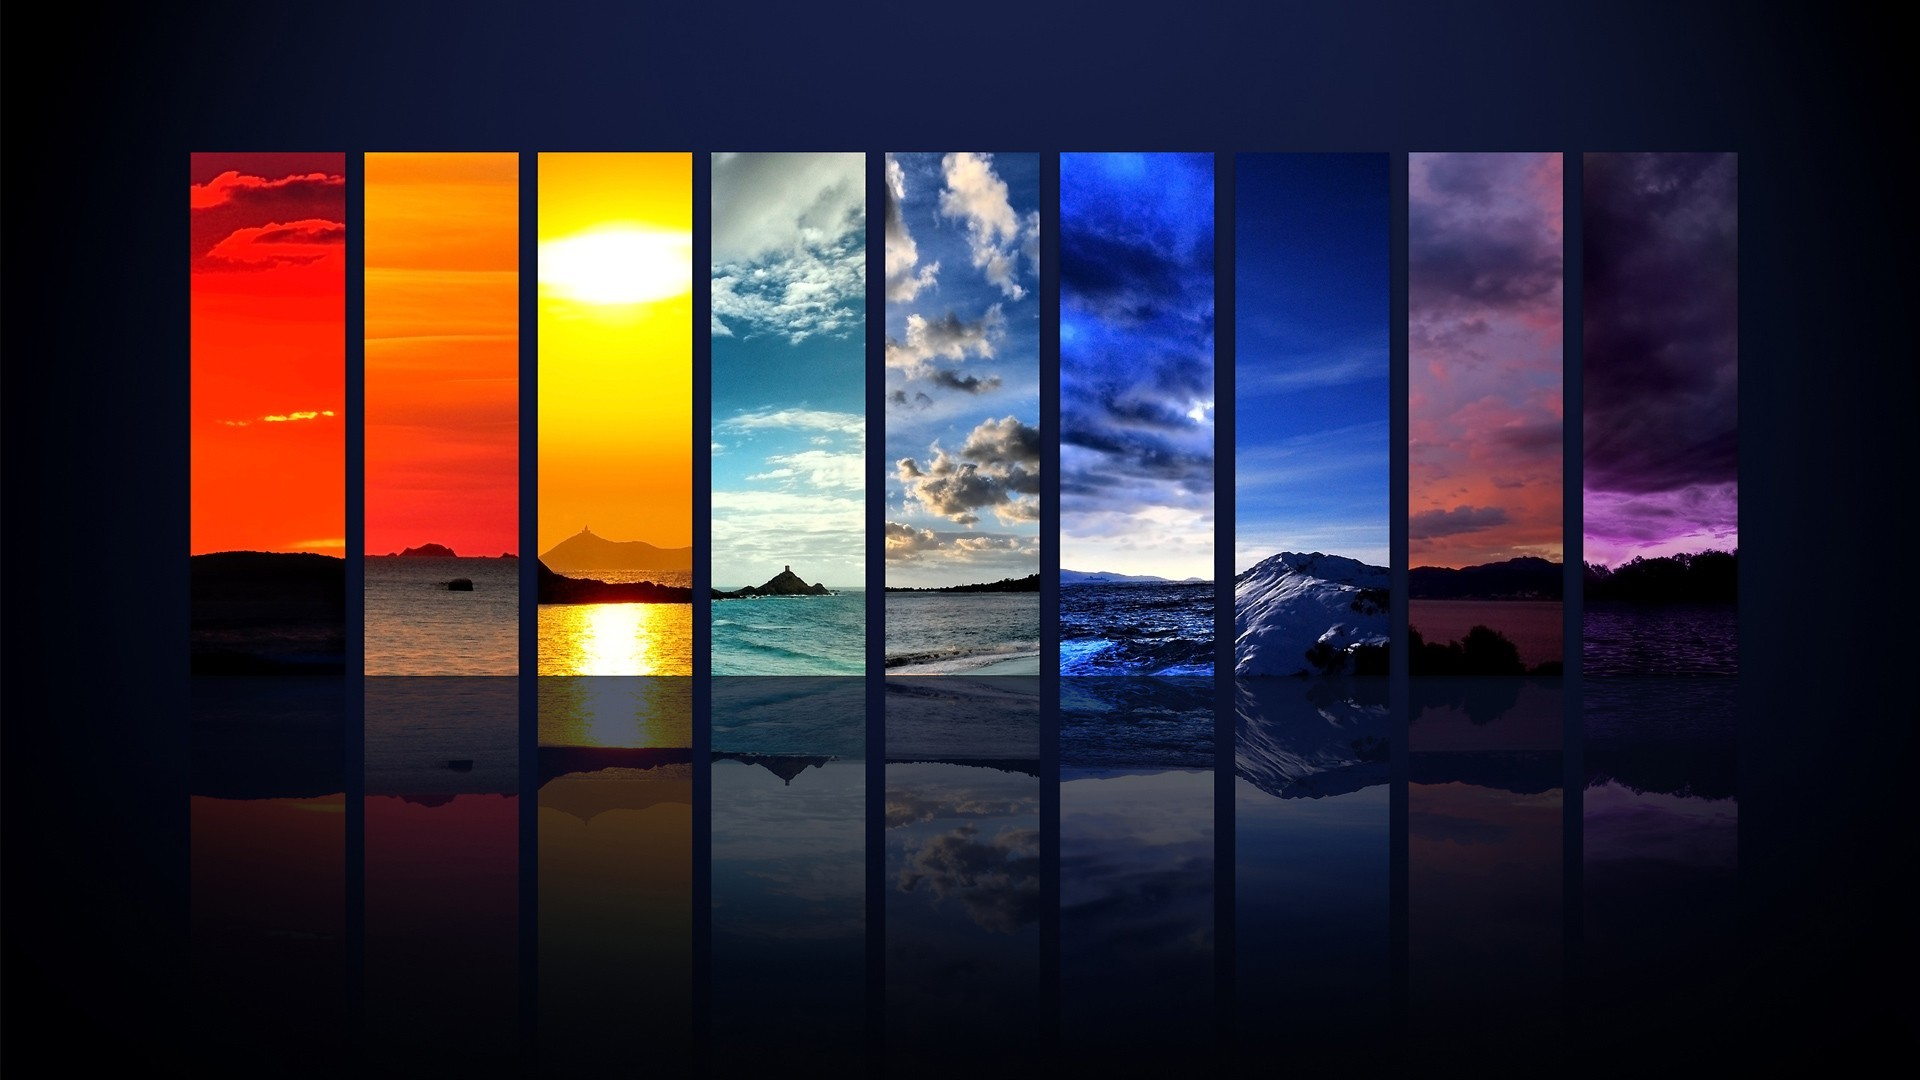 Res: 1920x1080, 7. desktop-wallpaper-download6-600x338